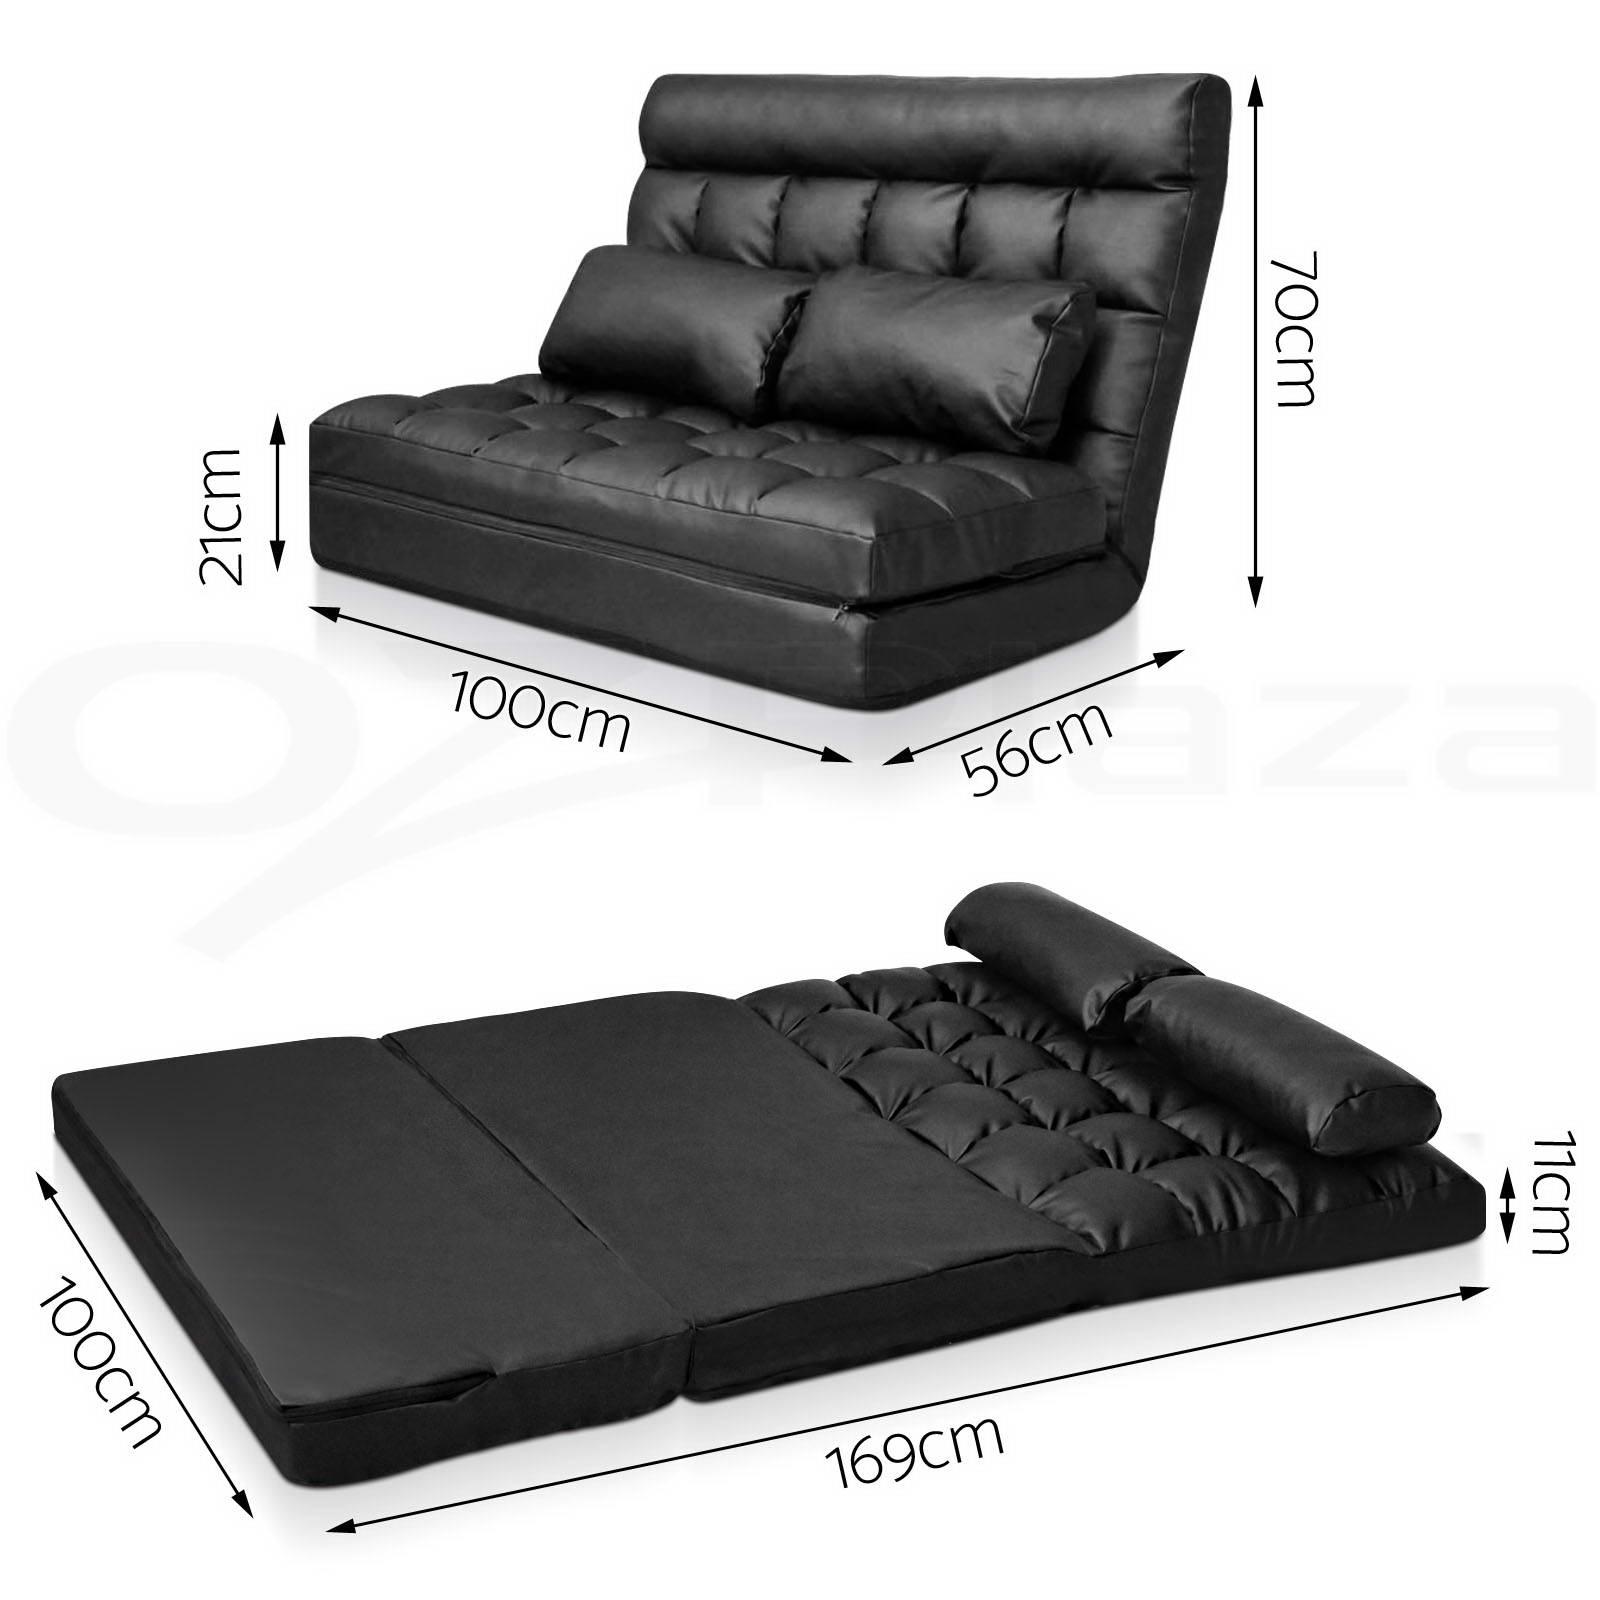 Ebay Recliner Chairs Set Leisure Recliner Swivel Chair